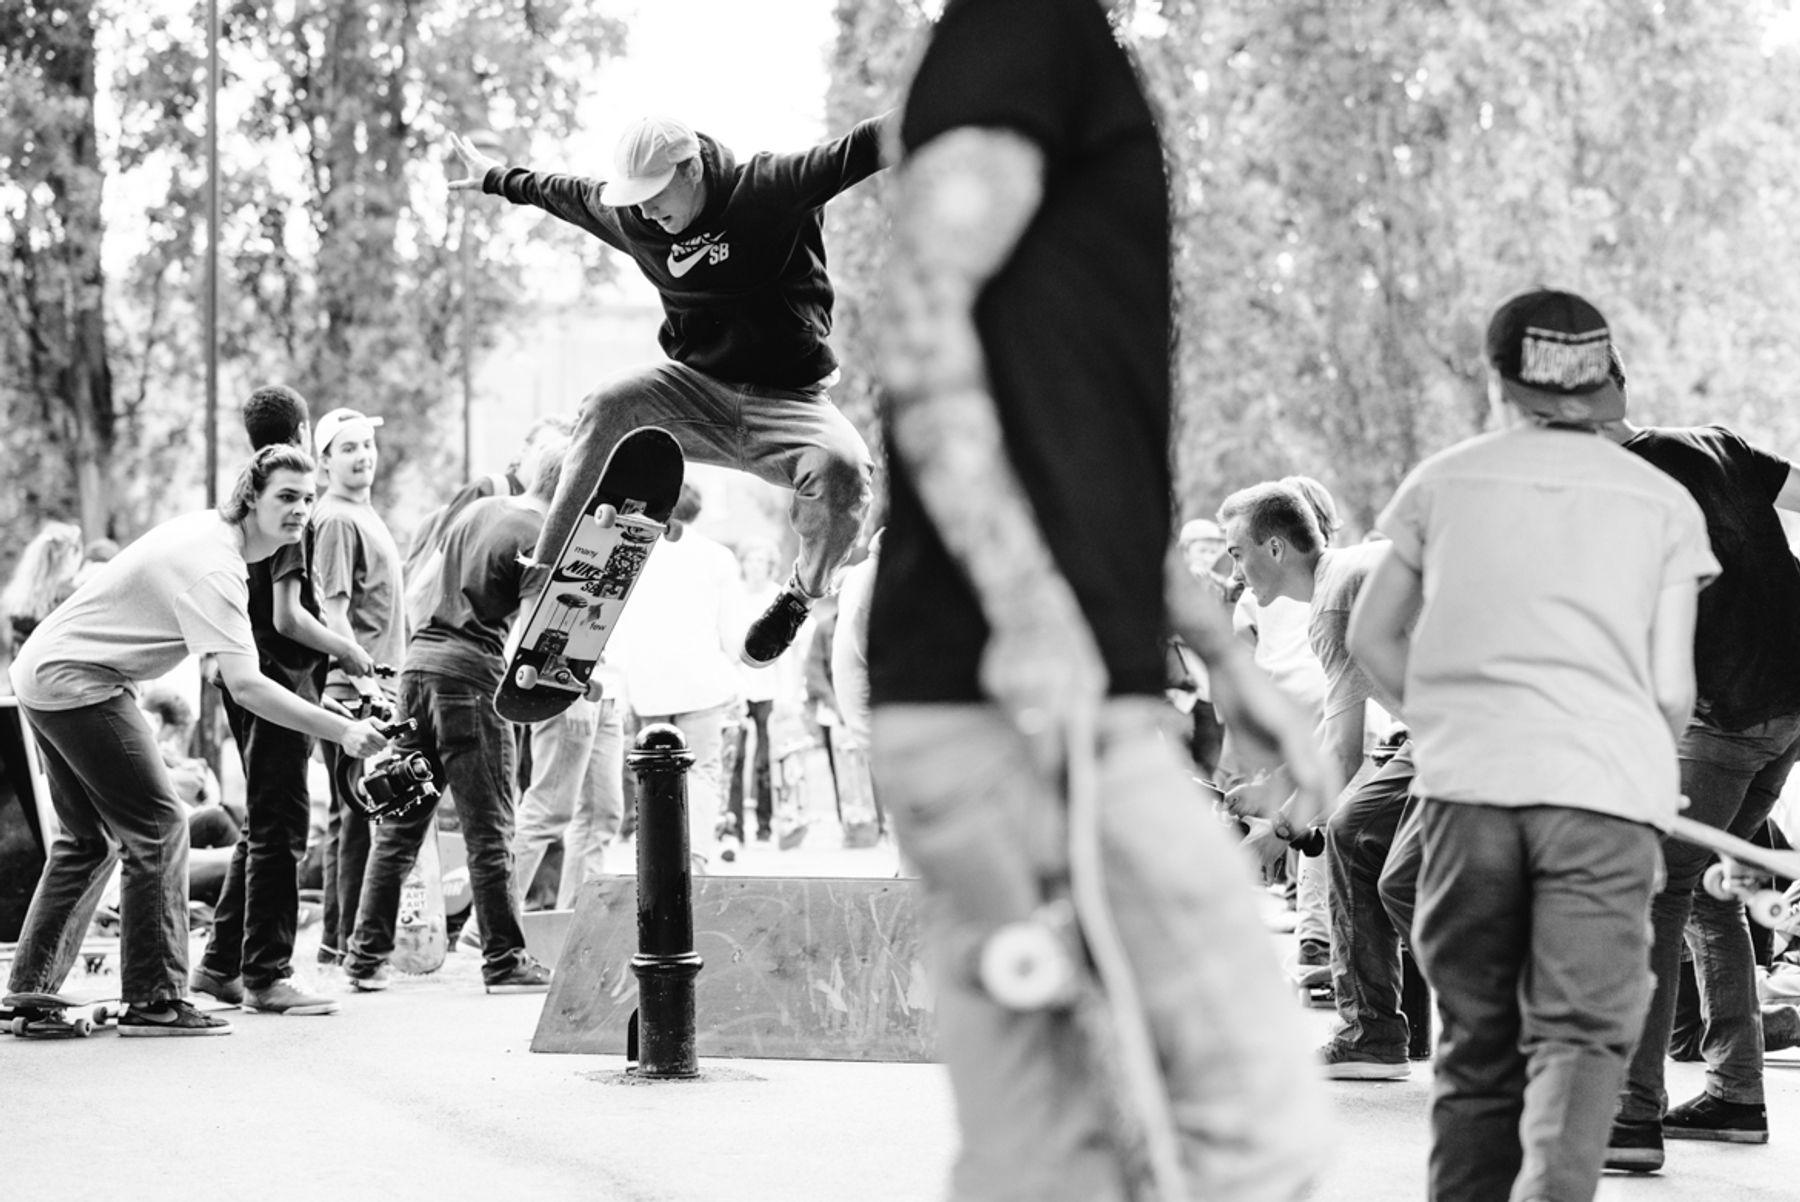 _IHC7601e-Casper-Brooker-No-Comply-Nike-SB-x-Slam-City-Skates-Go-Skateboarding-Day-London-June-2015-Photographer-Maksim-Kalanep